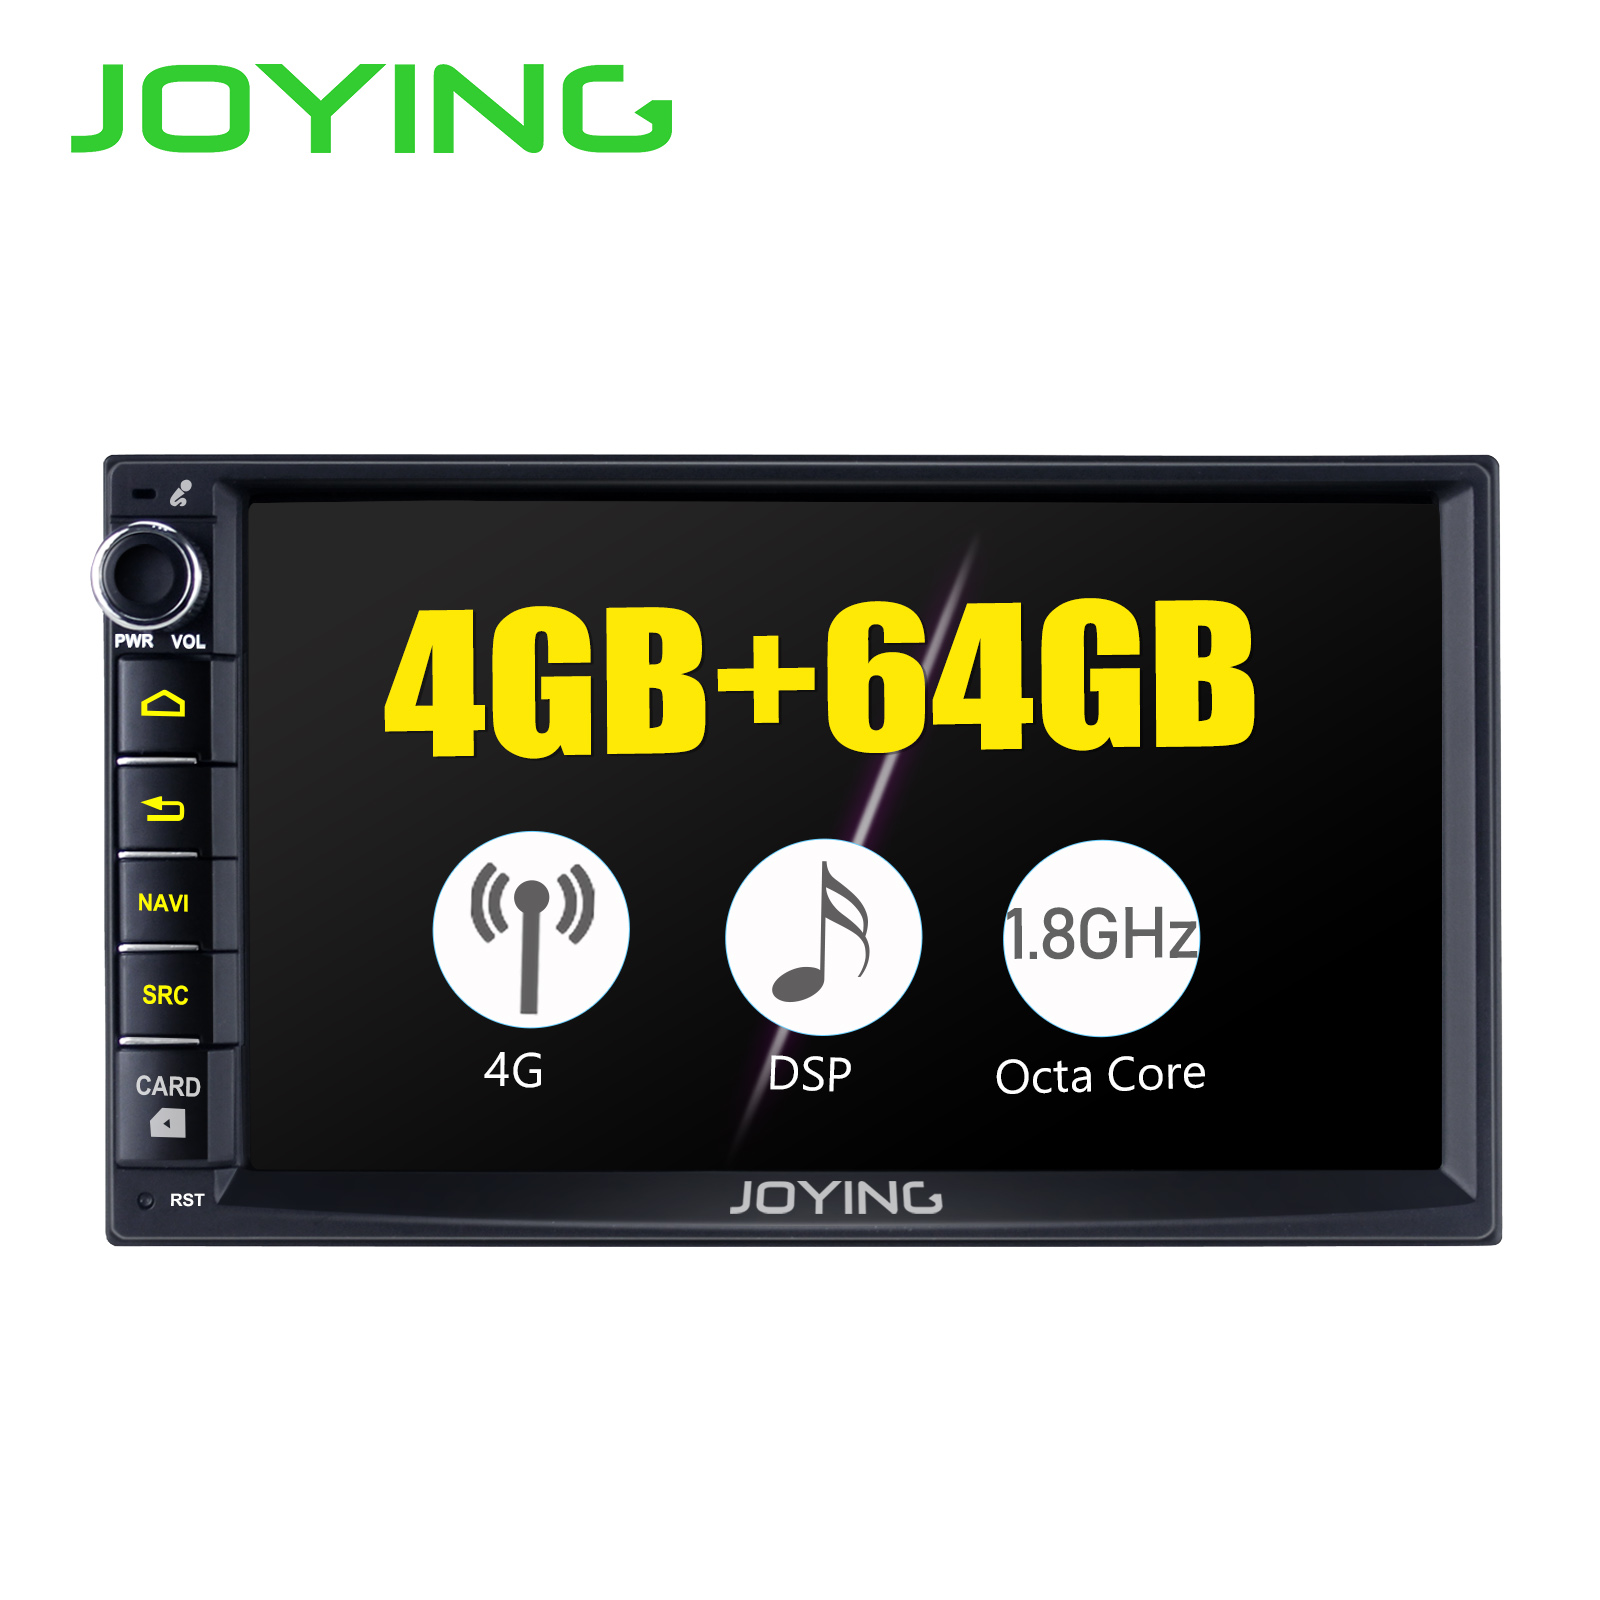 JOYING 2 din Android 8.1 Car radio GPS Núcleo octa 1024*600 GB + 64 4 GB de áudio estéreo 7